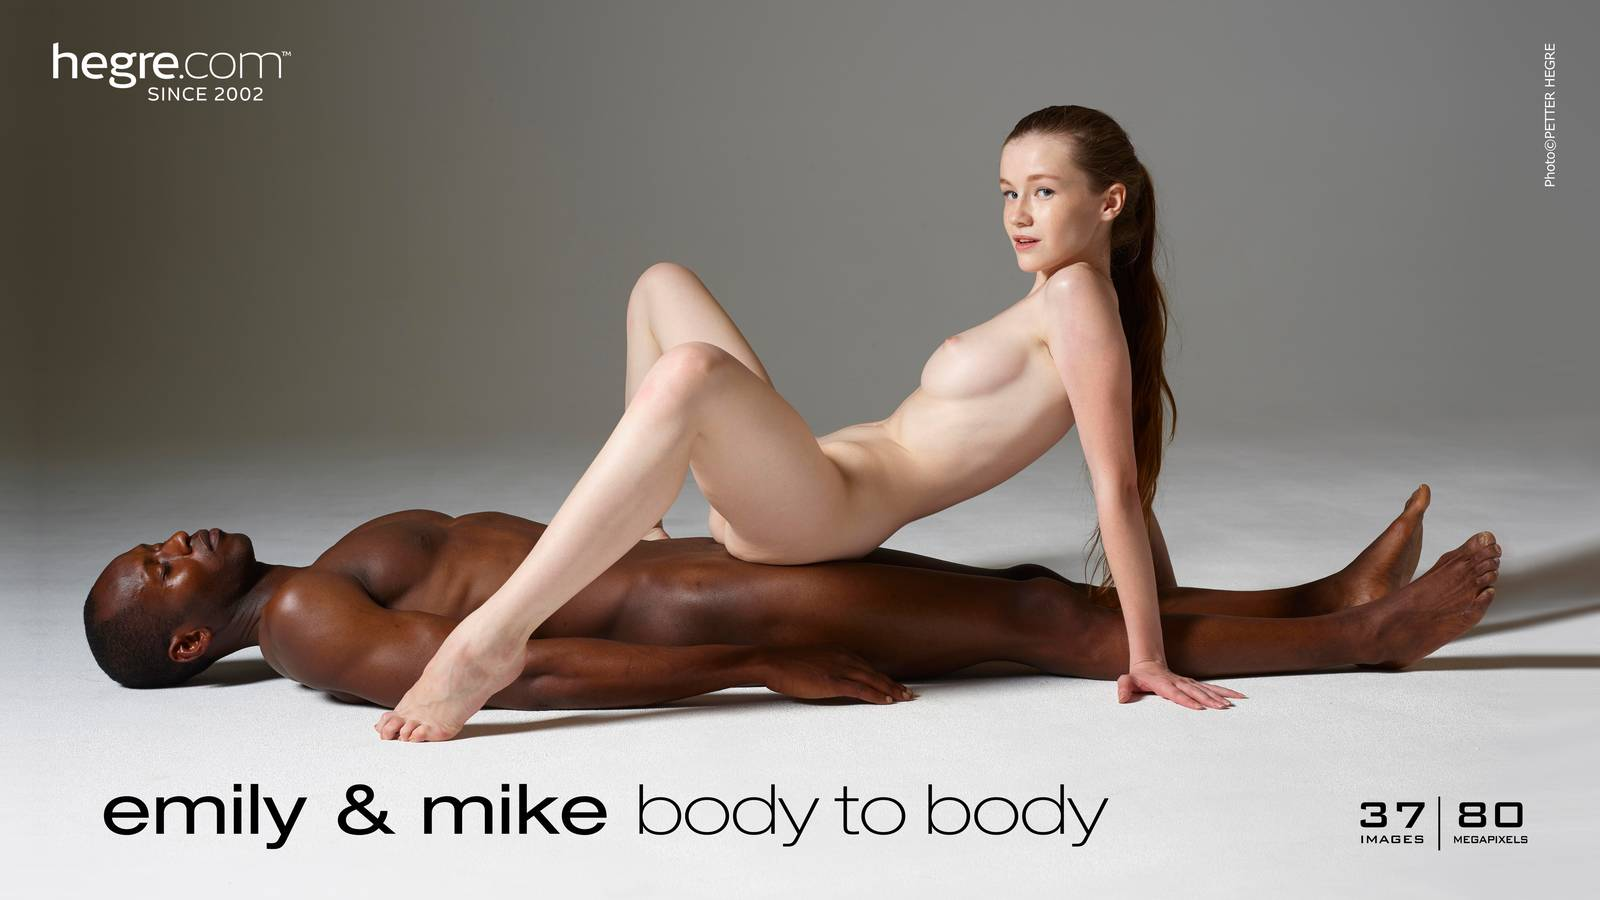 Hegre nudes sex, celebrity porn movies